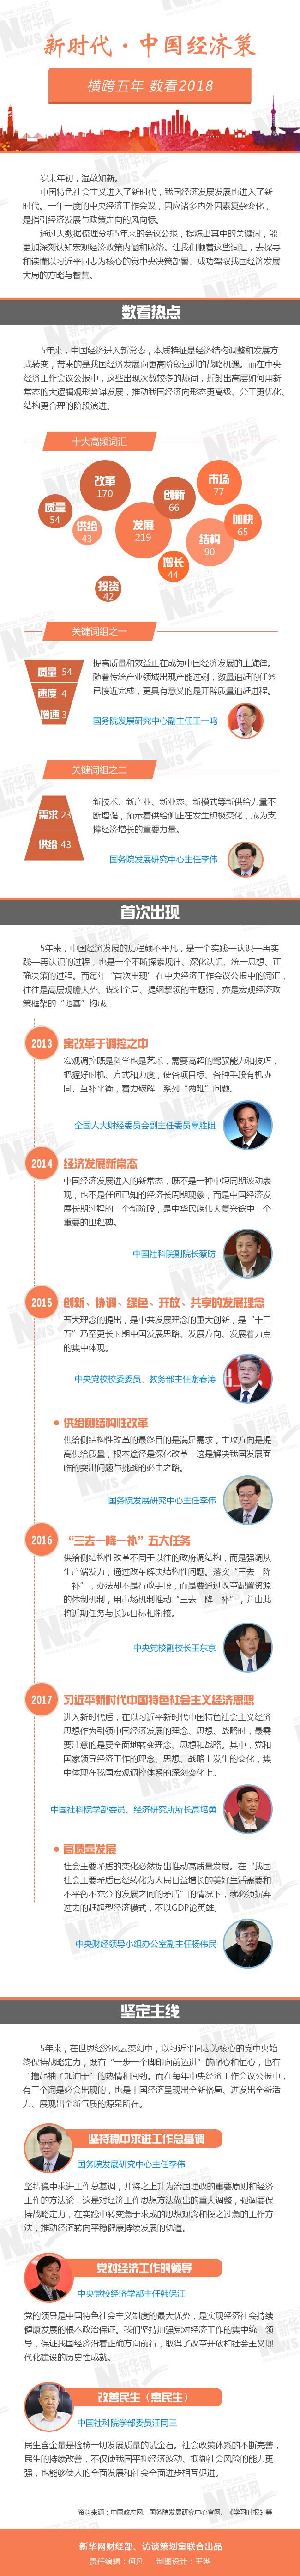 PK10全天计划网页版:横跨五年_数看2018――新时代・中国经济策